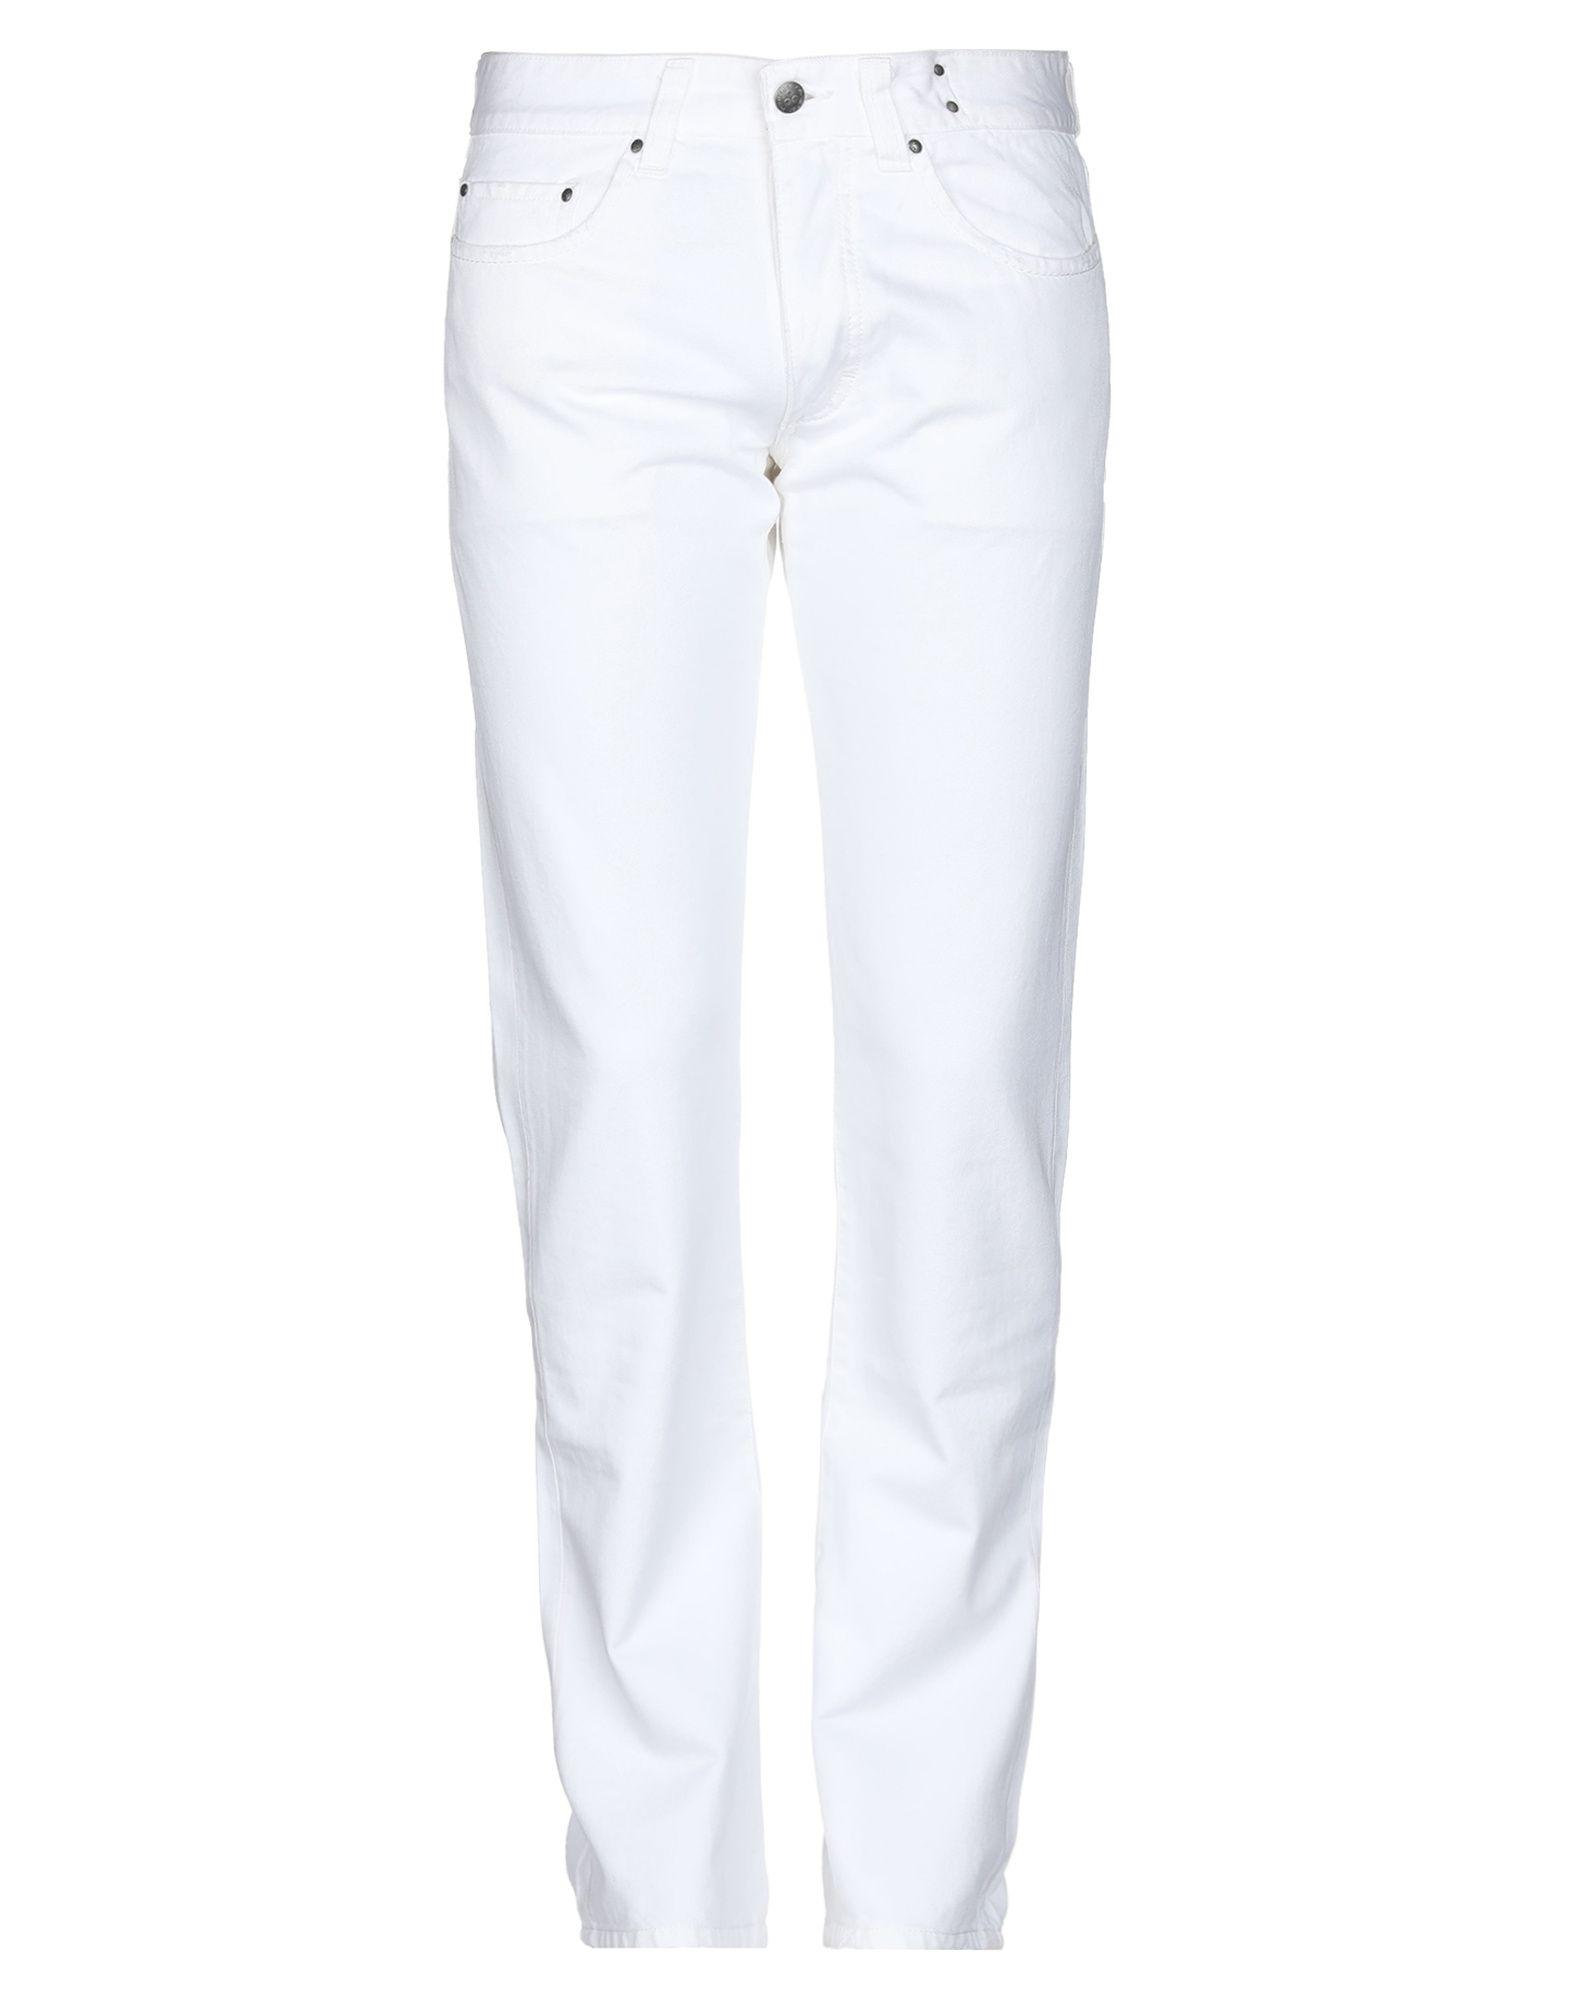 Pantalone Peuterey herren - 13263908IJ